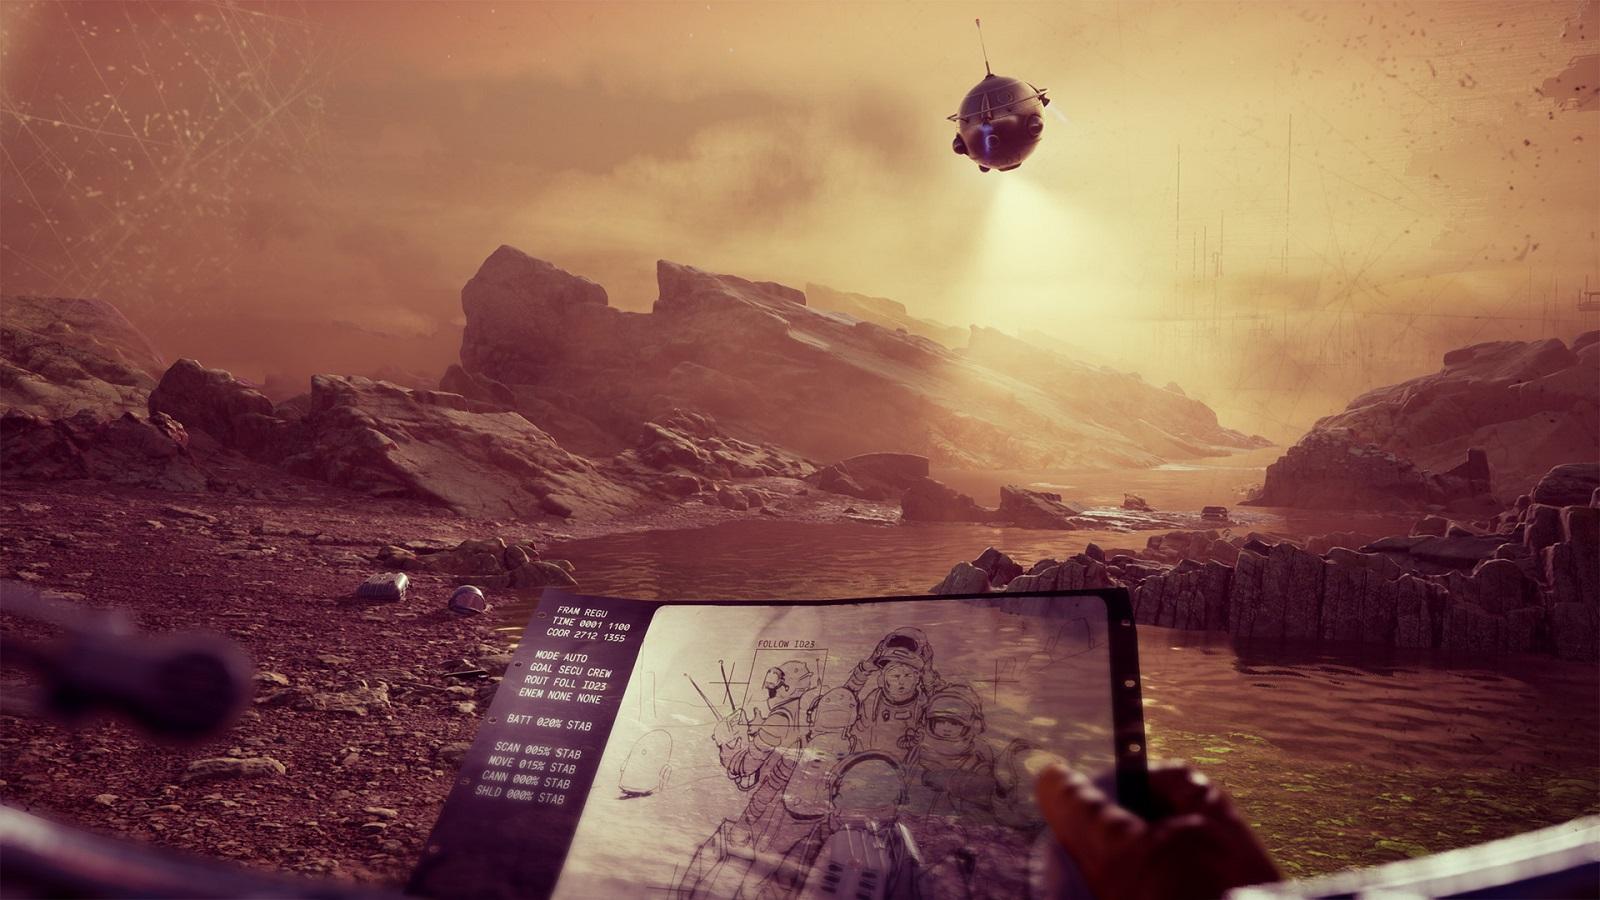 Бывшие сотрудники CD Projekt RED и Techland анонсировали приключение The Invincible по роману Станислава Лема - 01